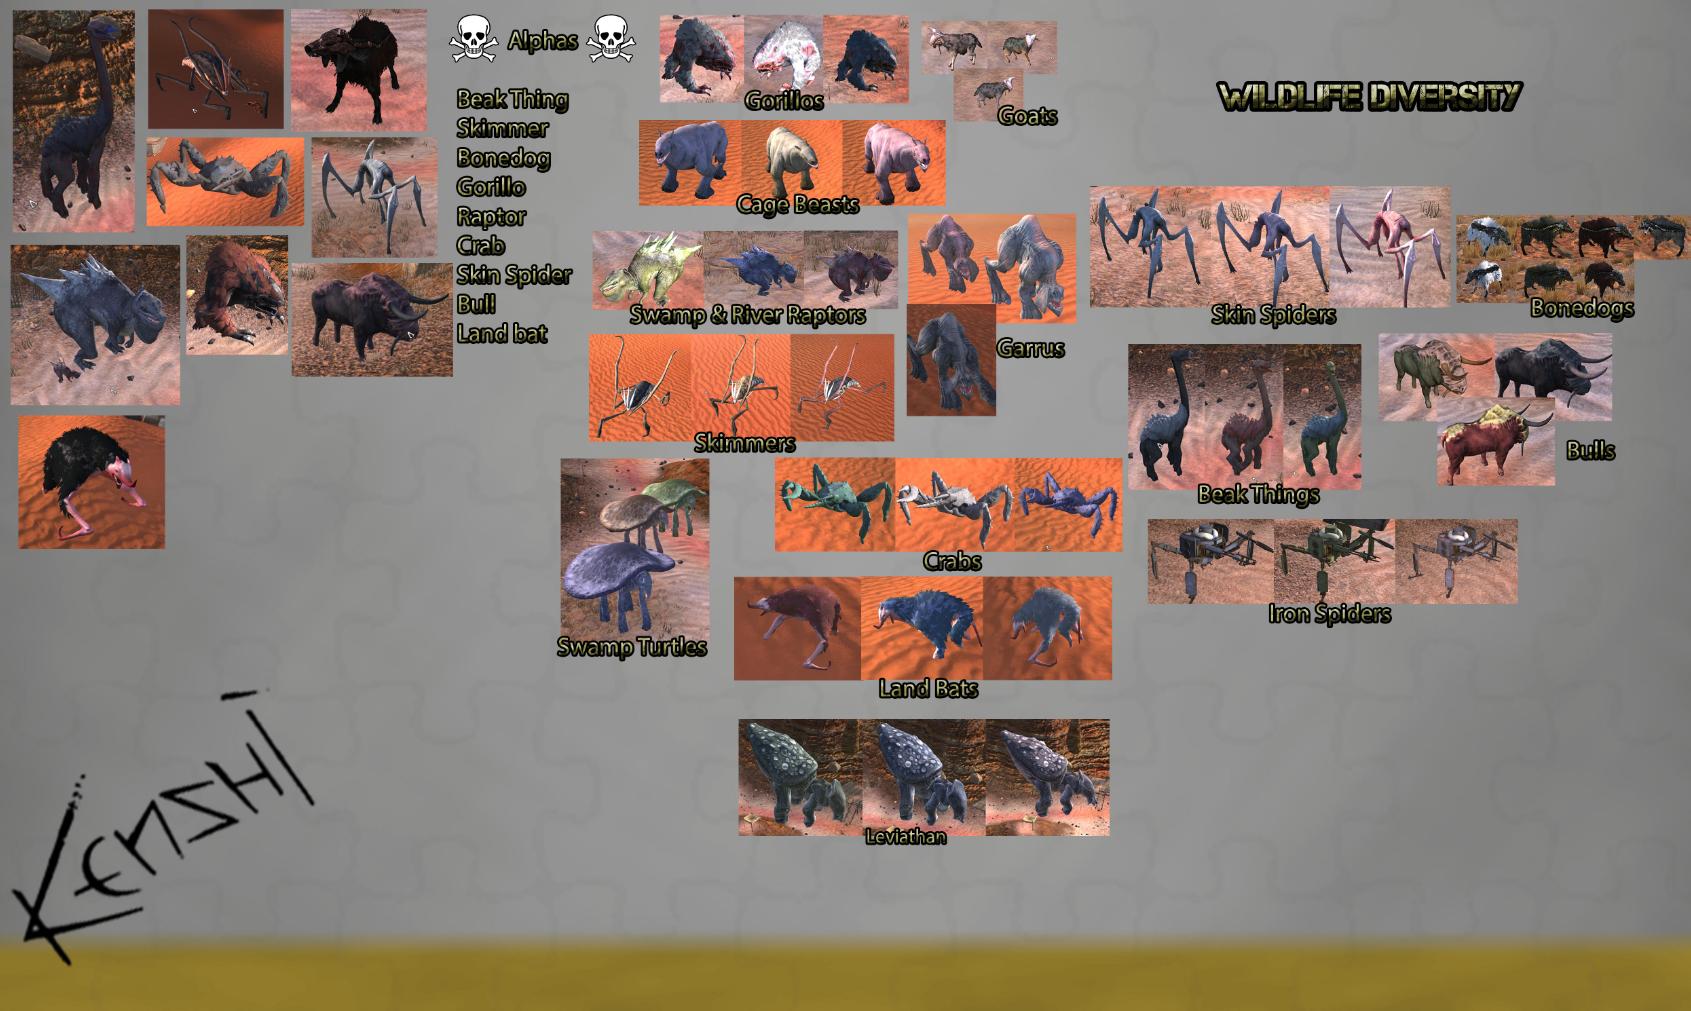 Wildlife Diversity - Standalone (RU)